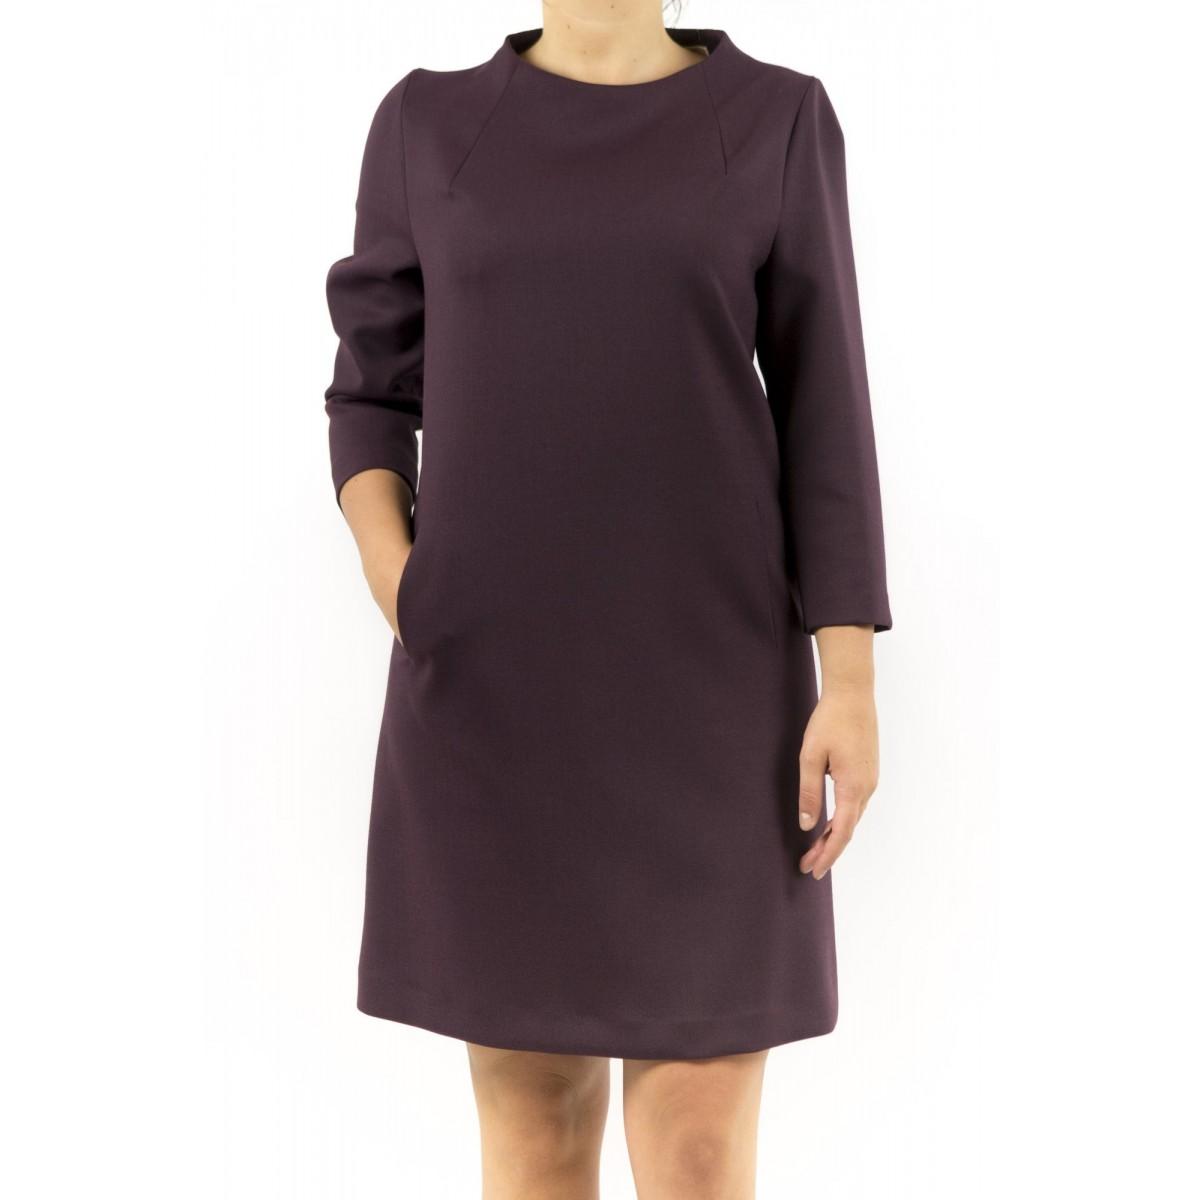 Dress Erika Cavallini - Semicouture - P5I023